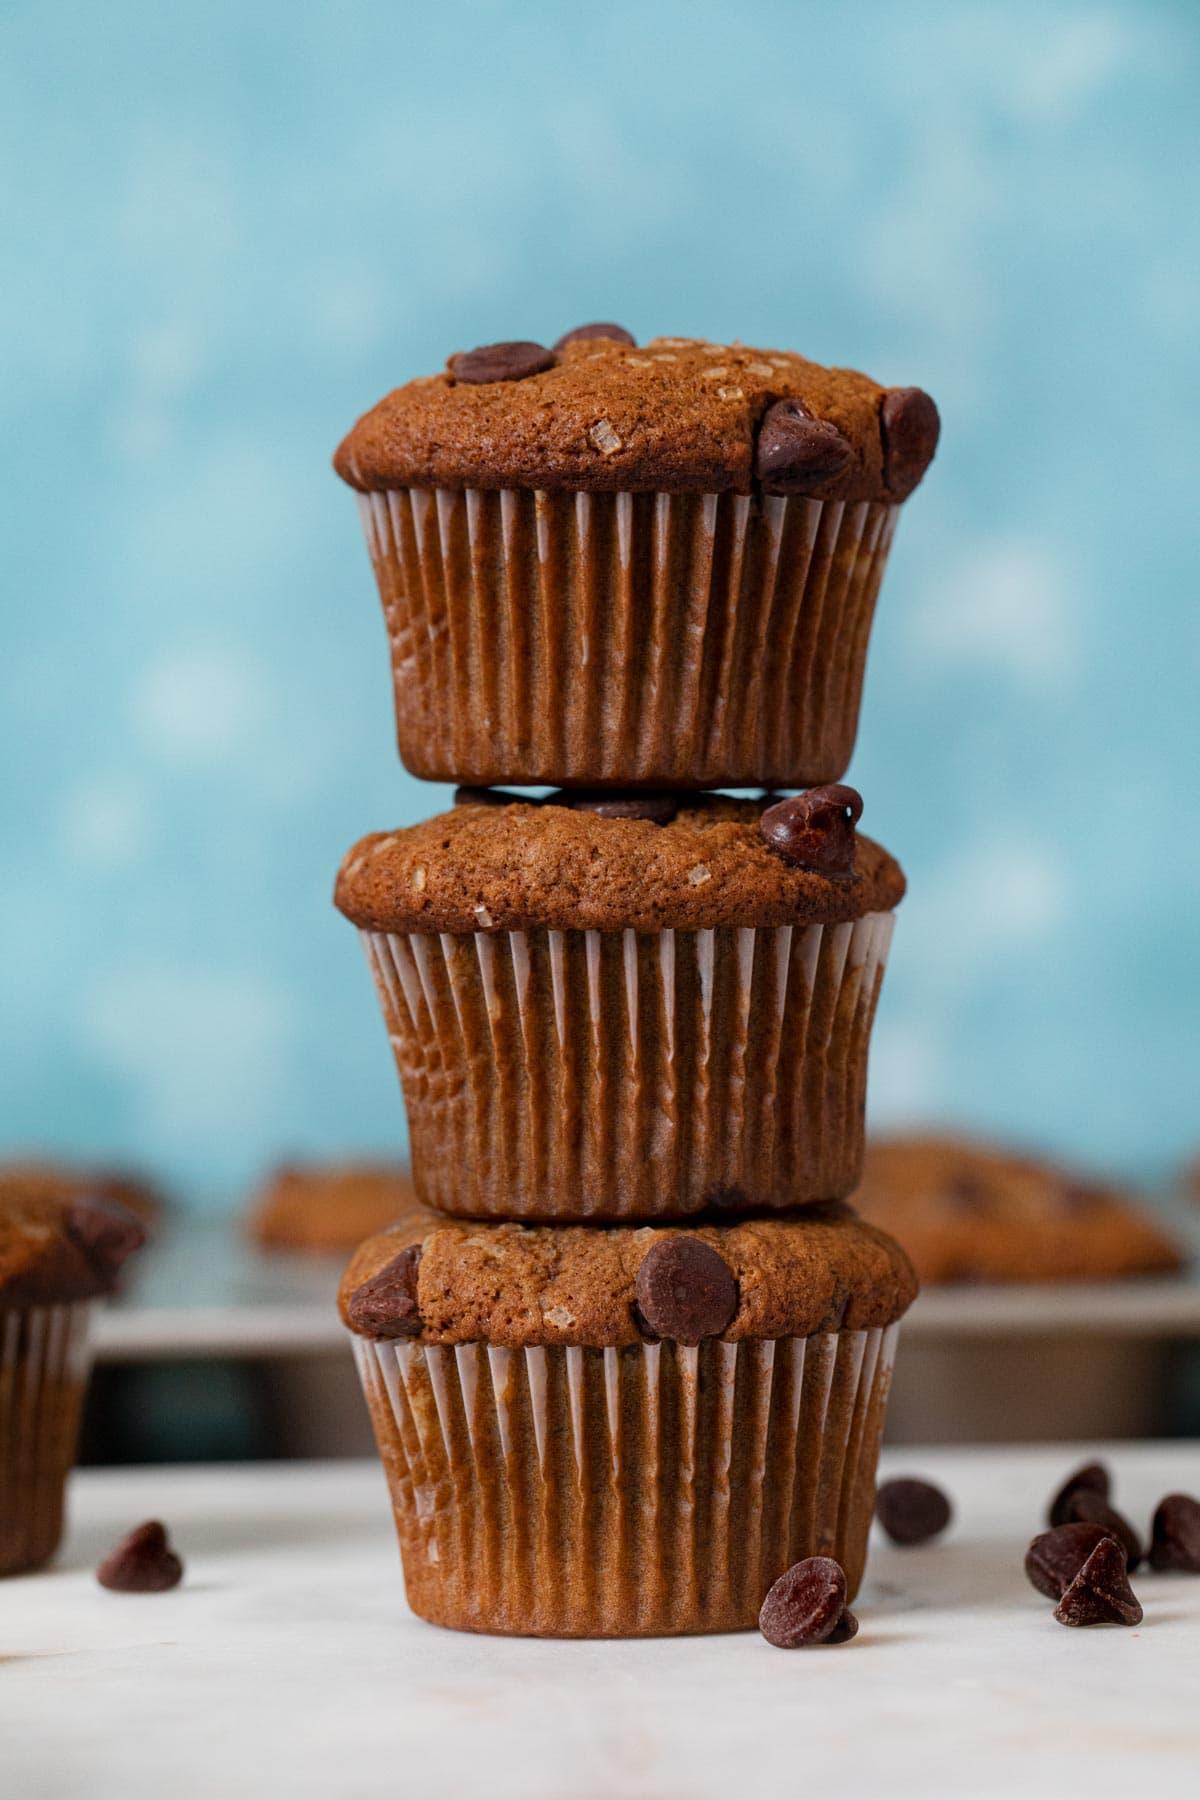 Mocha Chocolate Chip Banana Muffins in stack